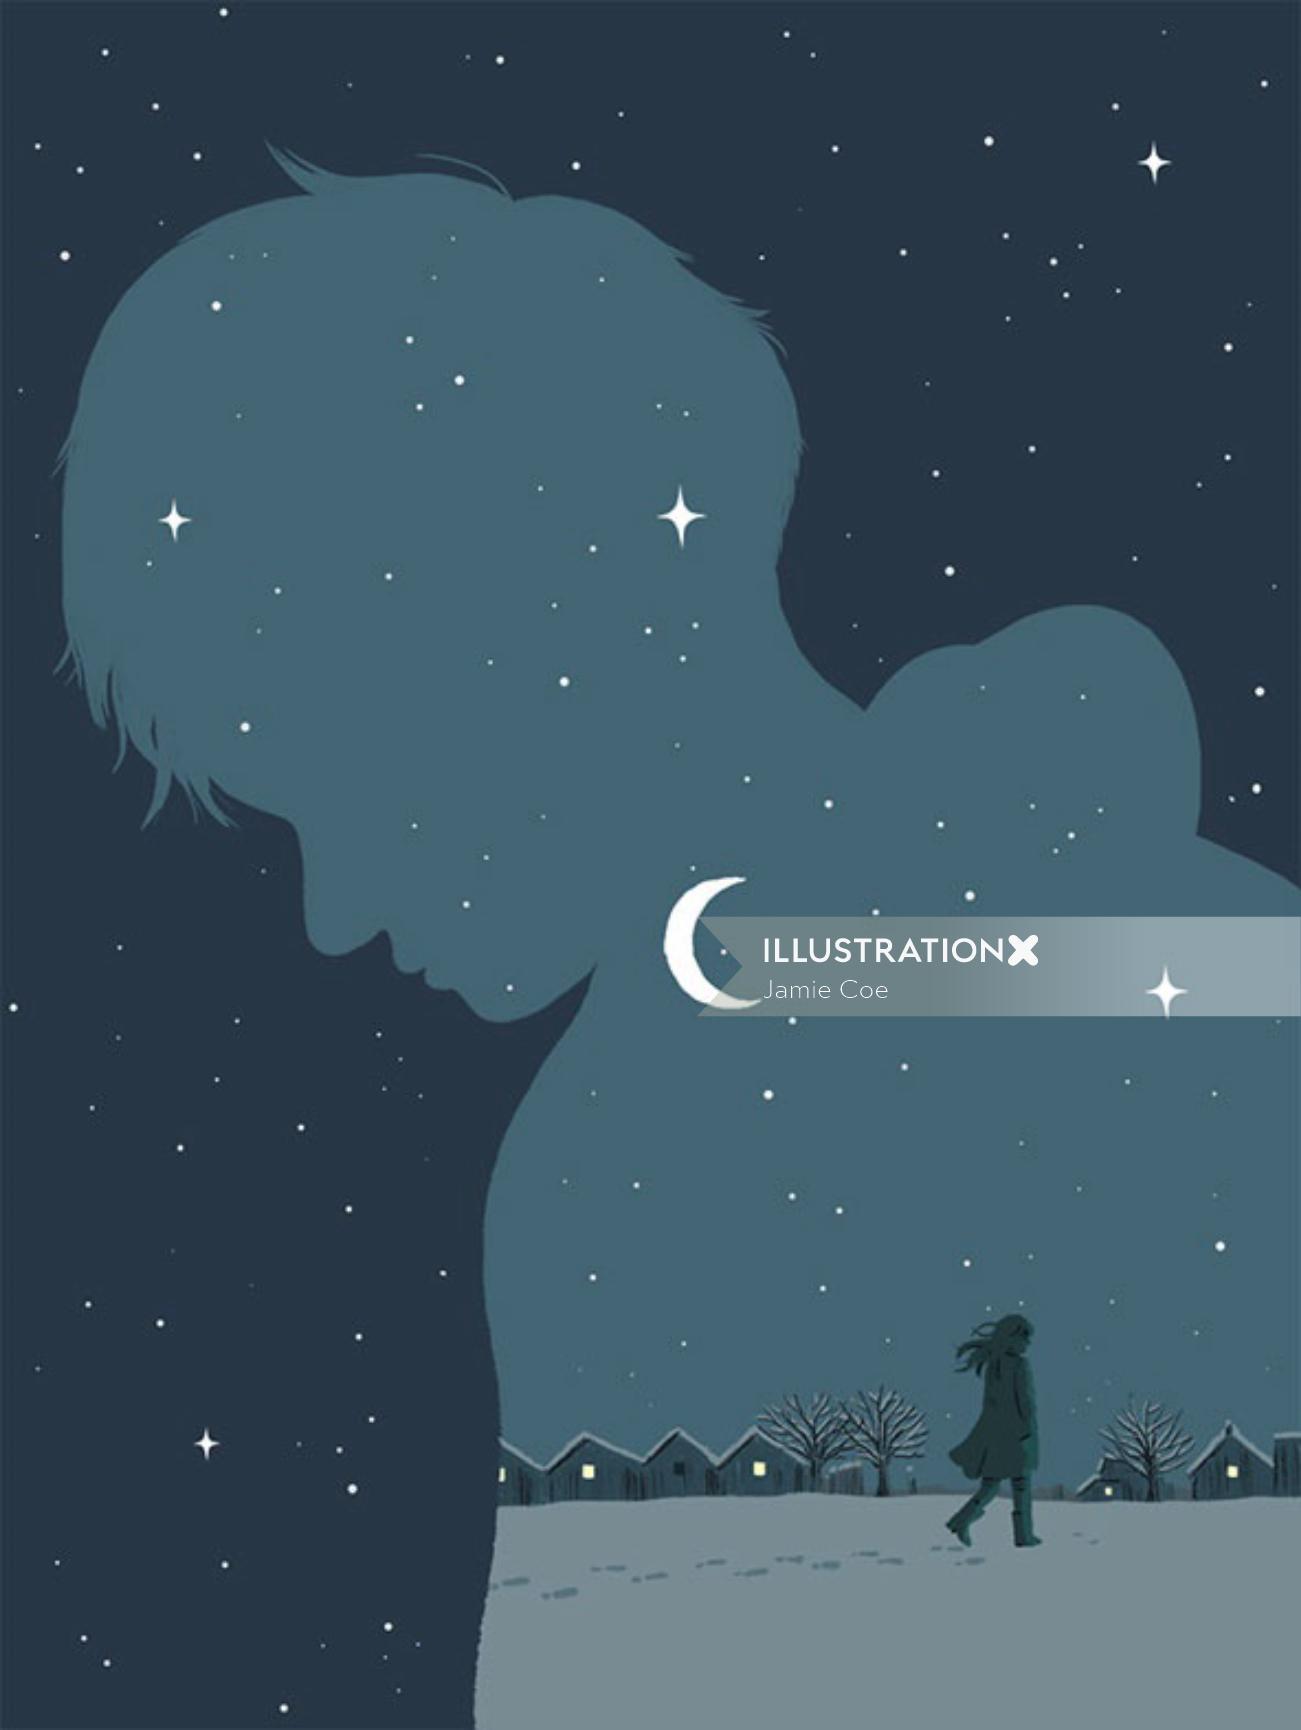 Digital painting of night life